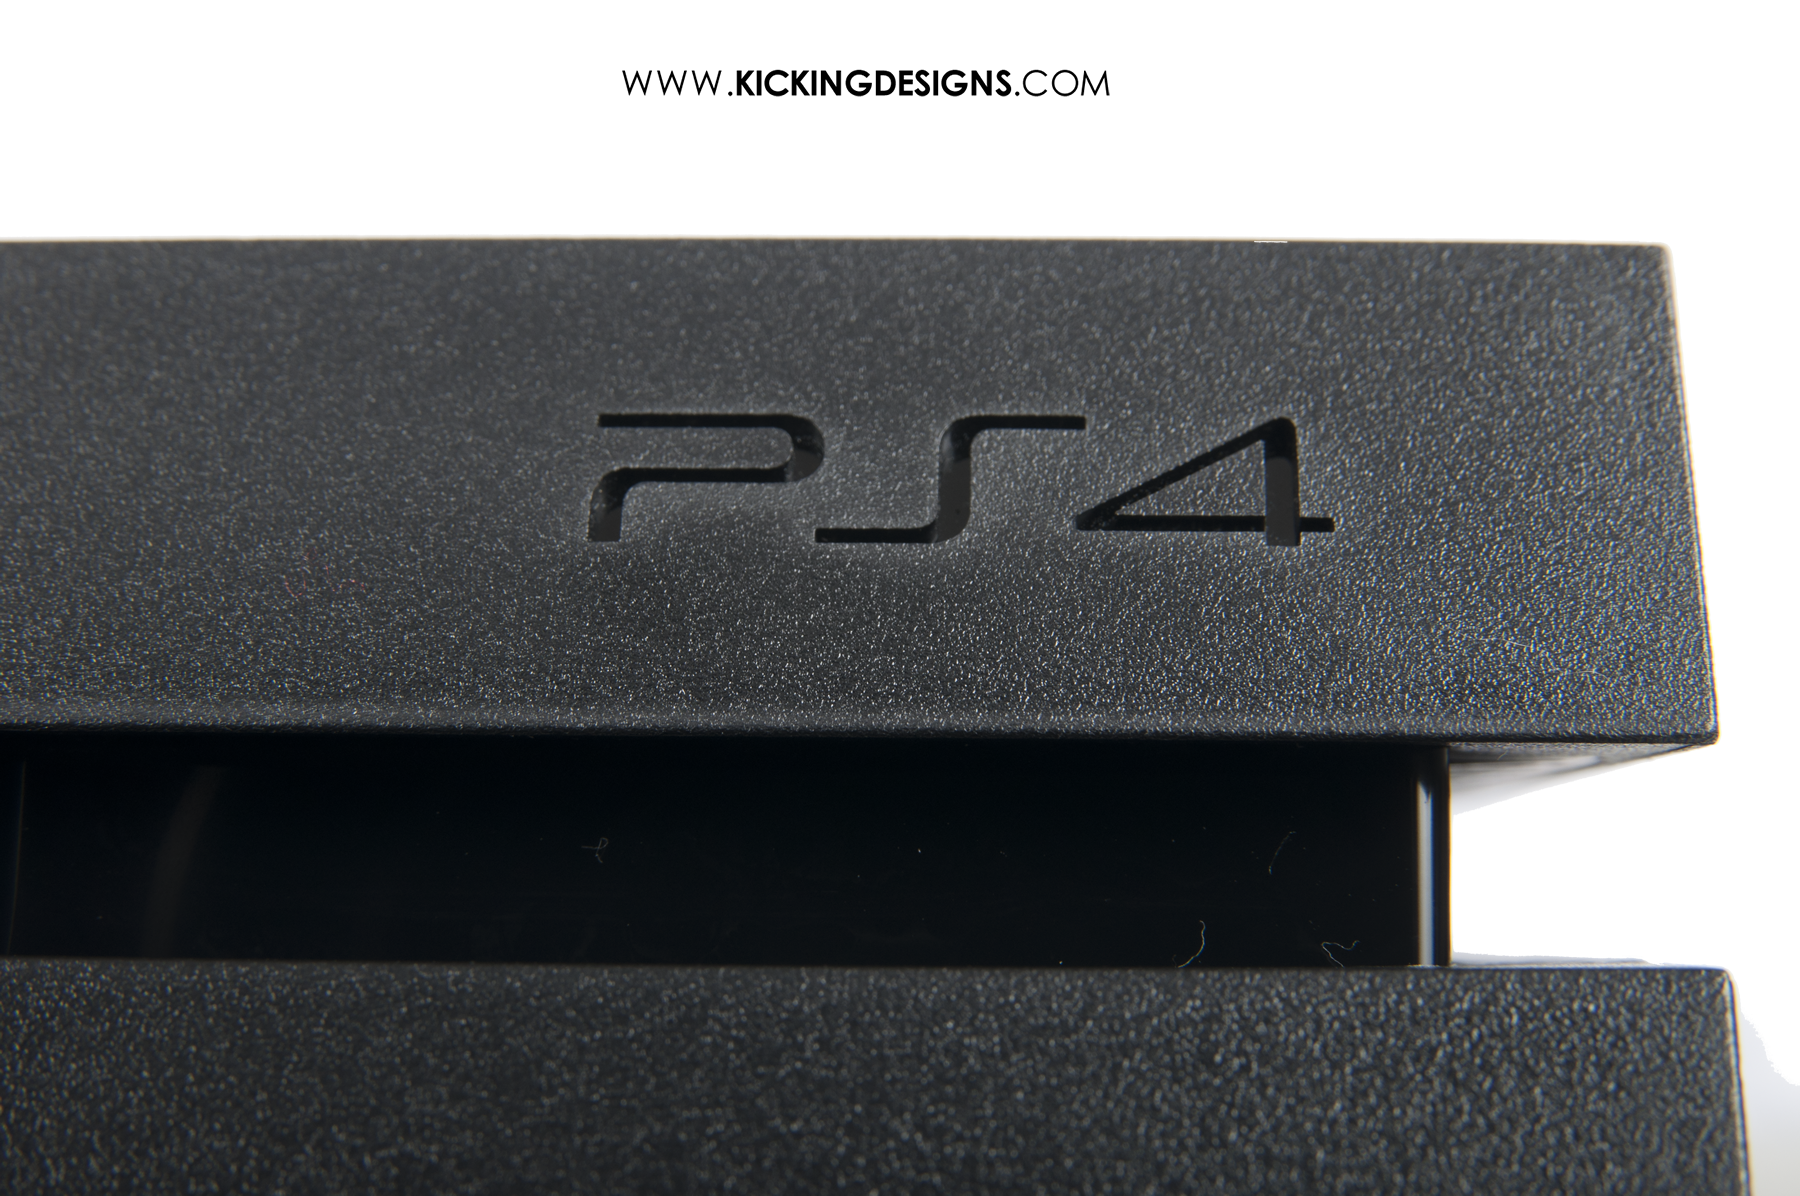 Playstation 4 Stock Photos Kicking Designs